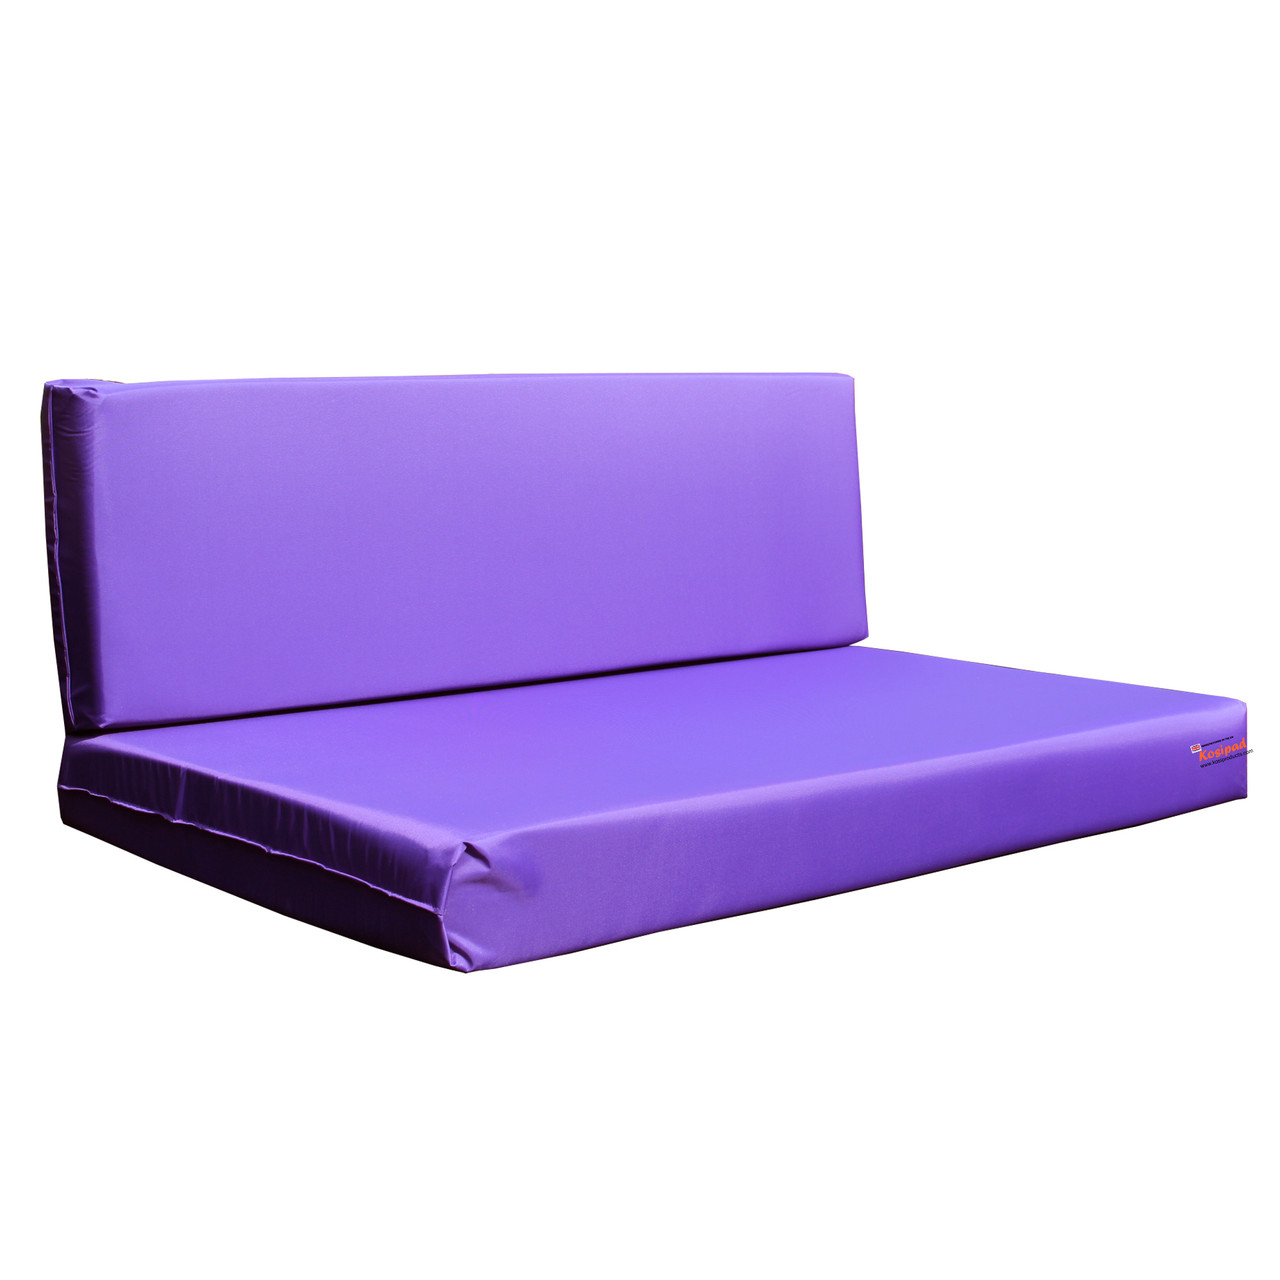 Kosipad Purple foam cushion pads seating Cushions for Euro Pallets